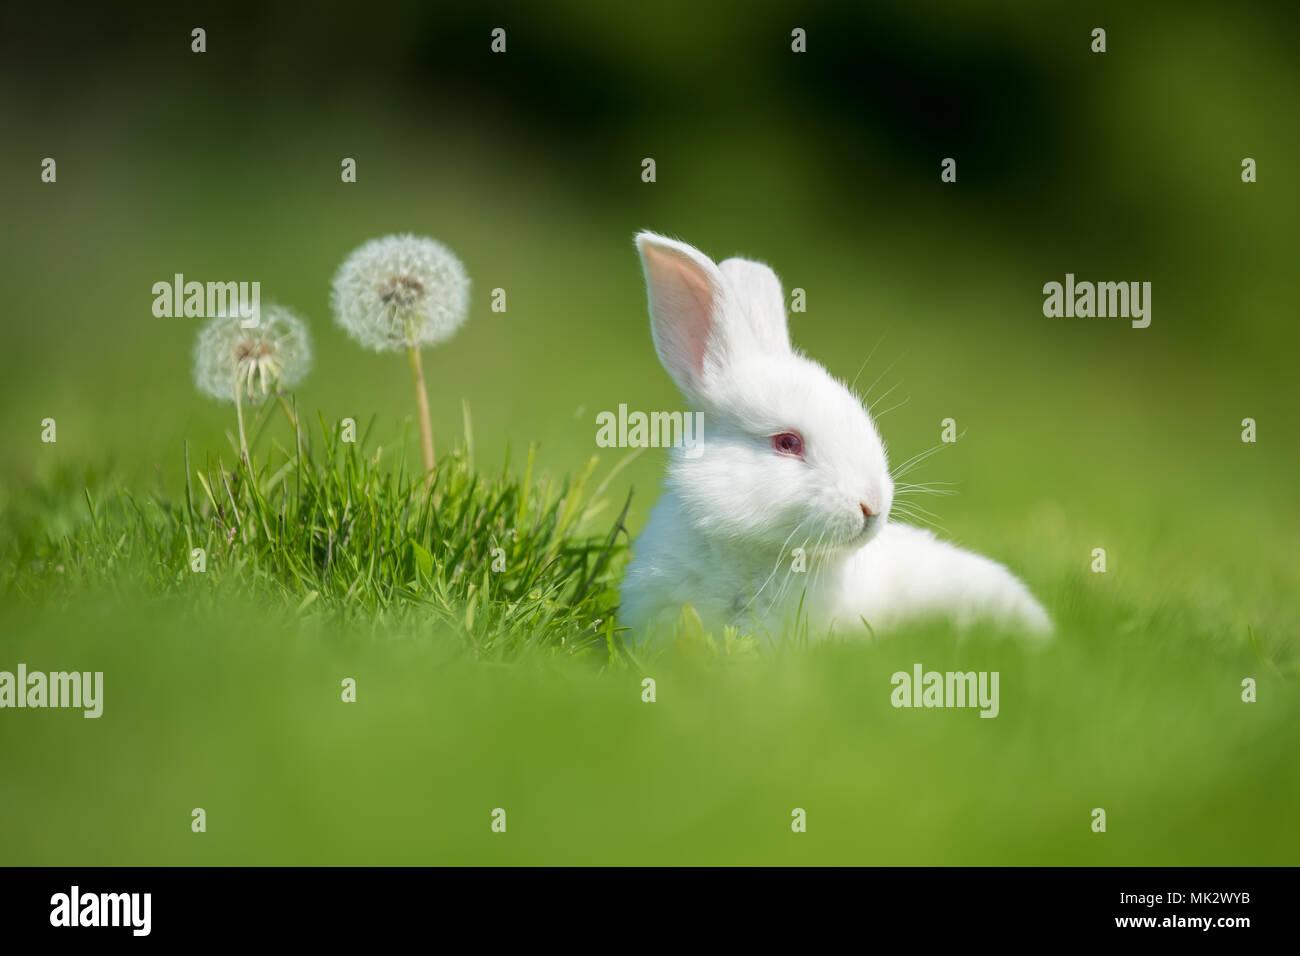 Little white rabbit on green grass in summer day - Stock Image